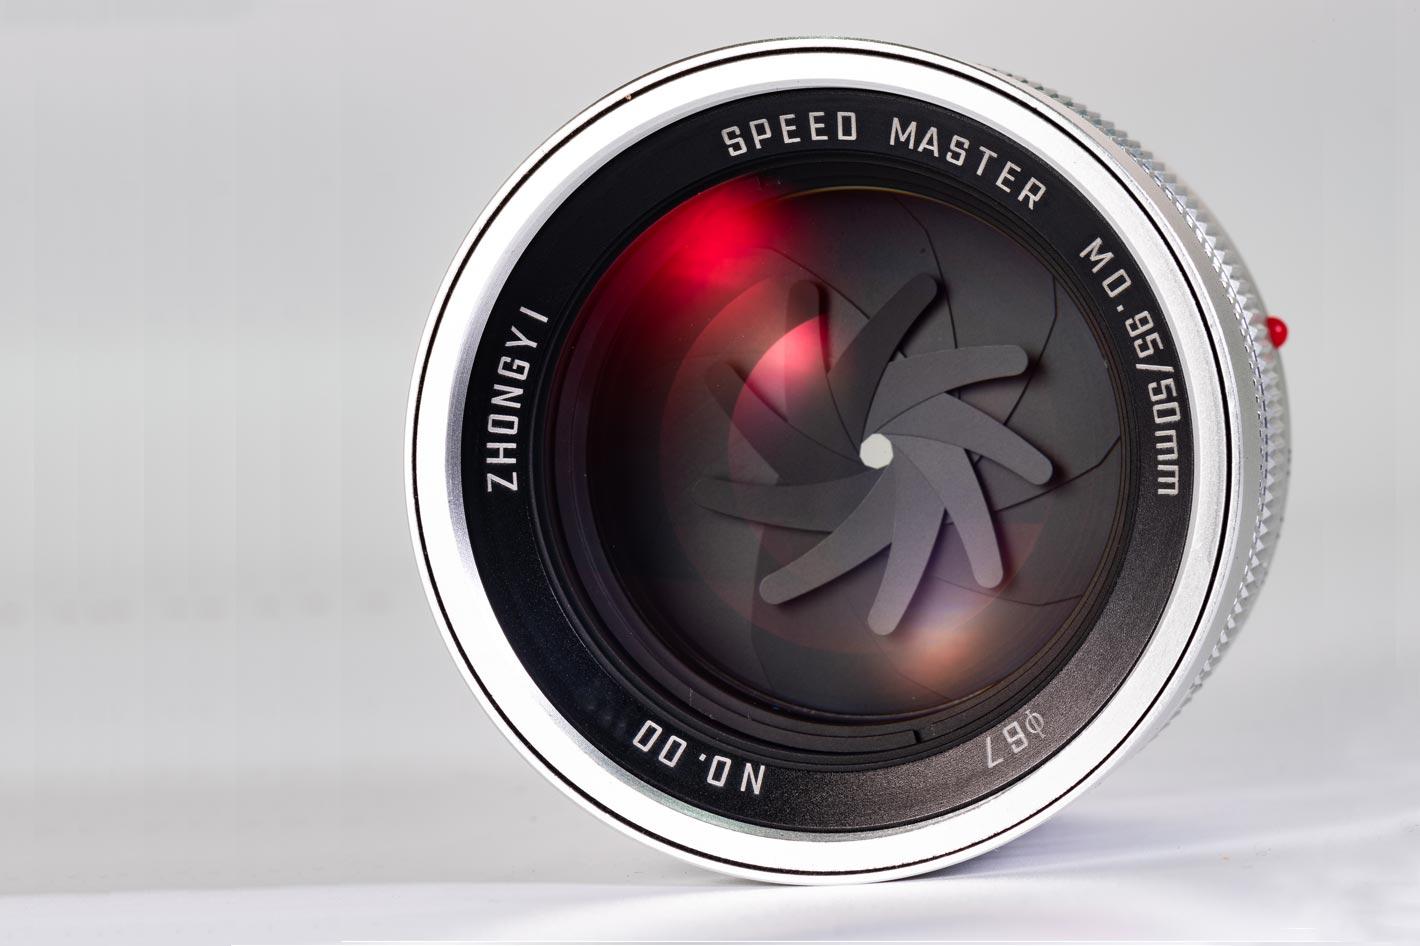 A new ZY Optics lens: the Mitakon Speedmaster 50mm f/0.95 for Leica M mount